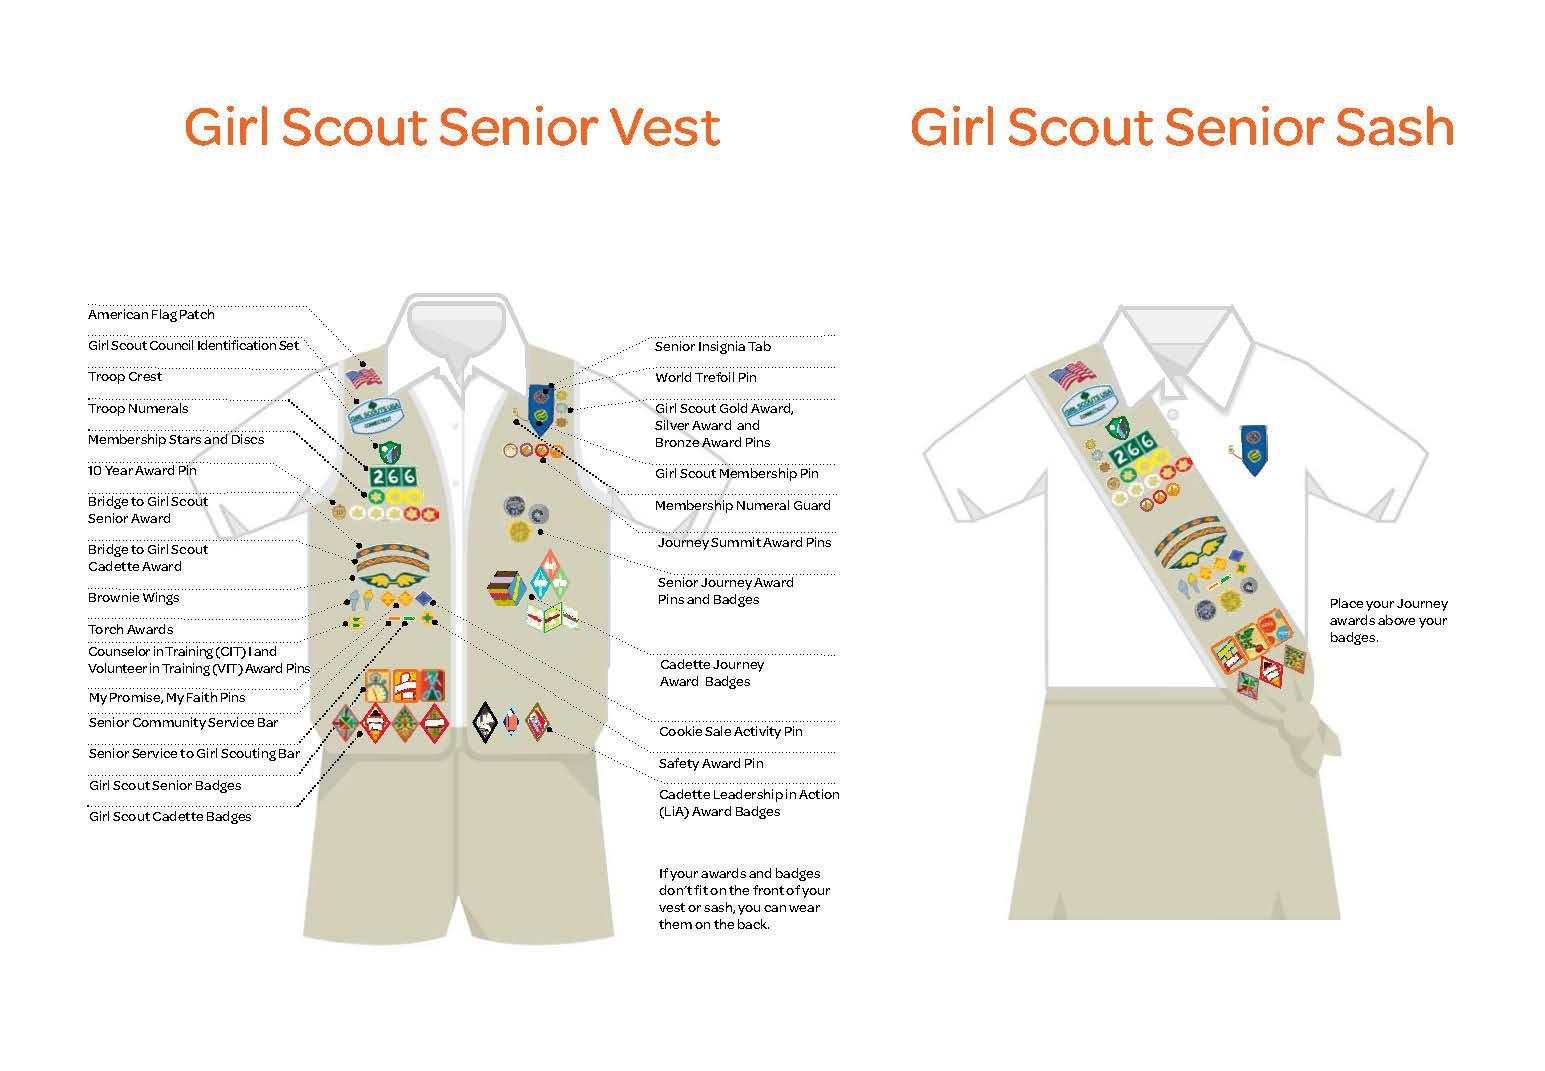 Girl Scout Senior Ambassador CIT COUNSELOR IN TRAINING AWARD PIN Bar Earned NEW